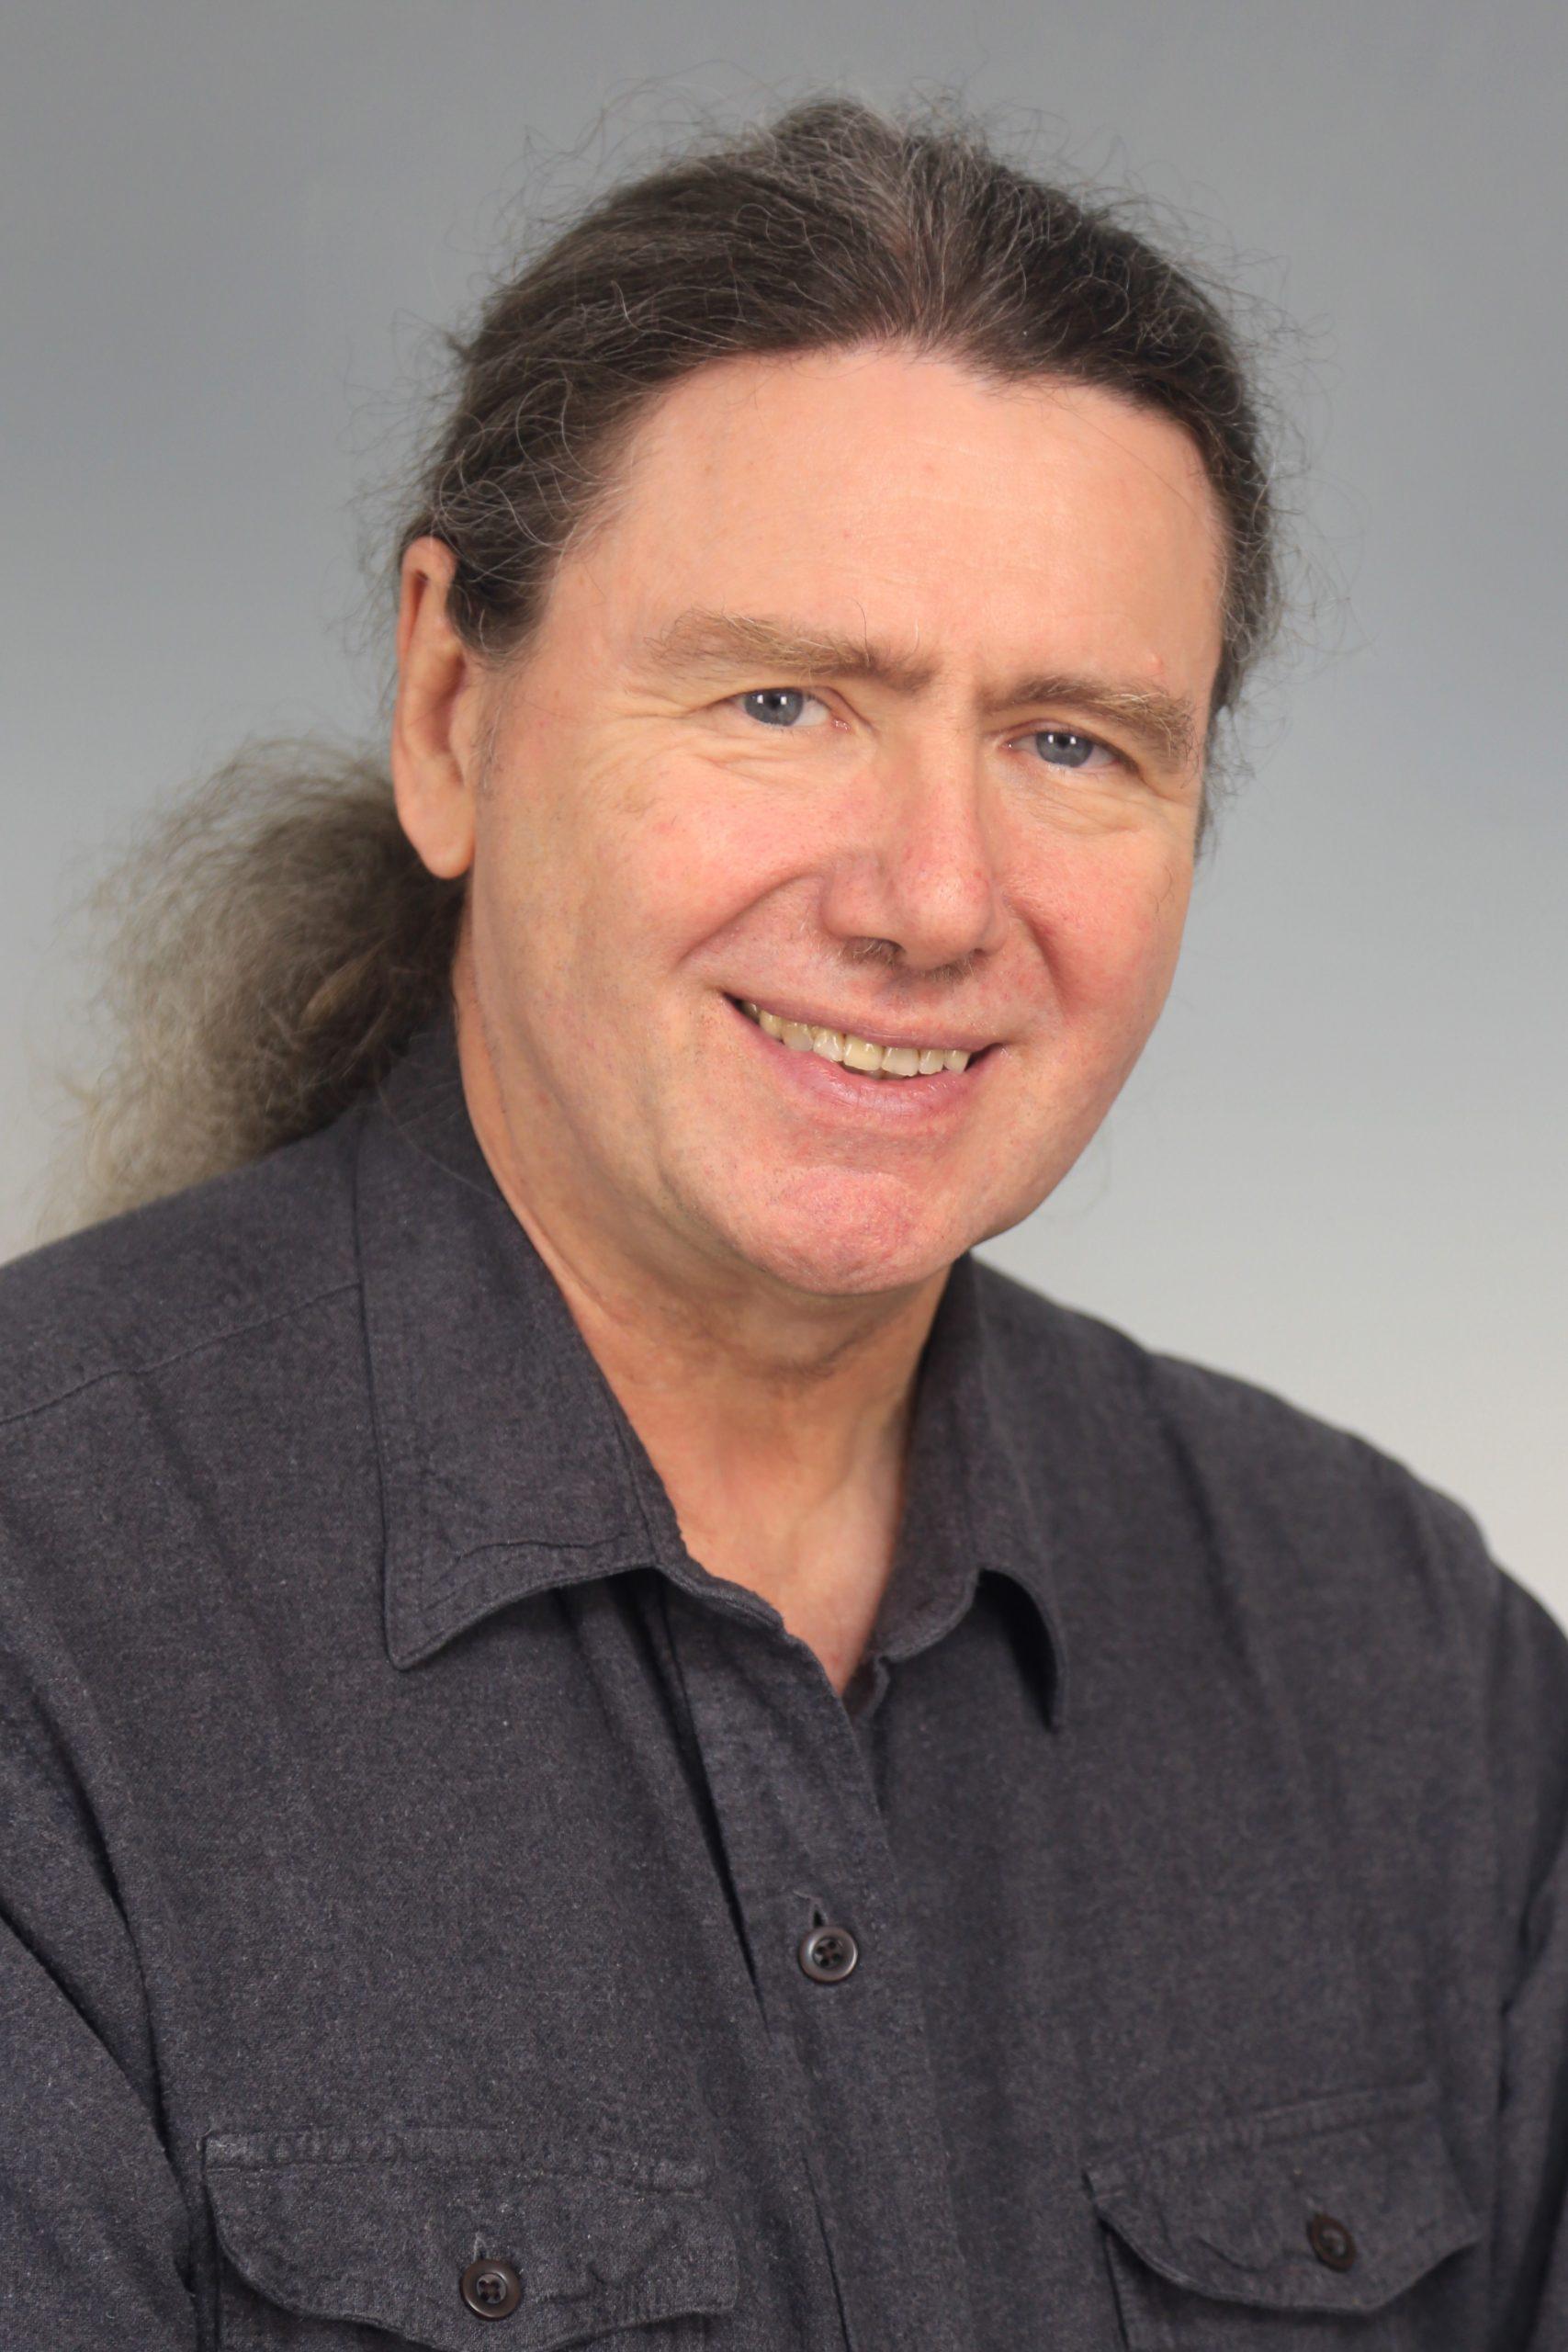 Holger Wentz